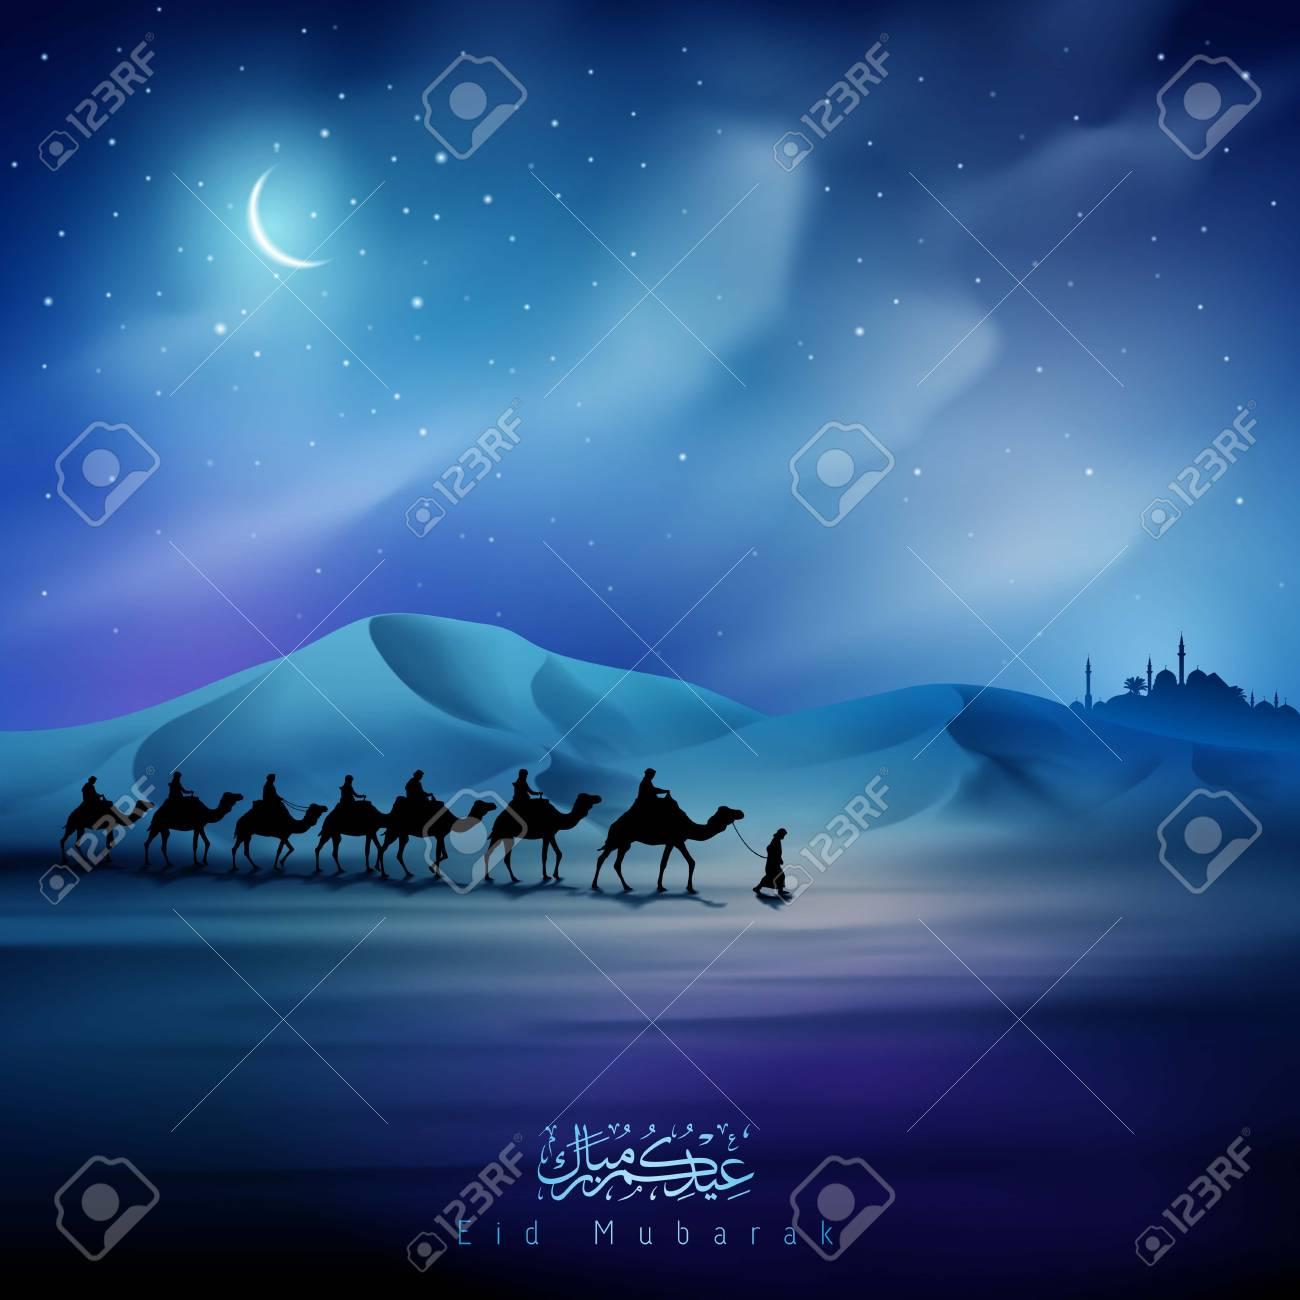 Eid mubarak greeting card template night illustration arabian eid mubarak greeting card template night illustration arabian and camel on desert islamic background stock vector m4hsunfo